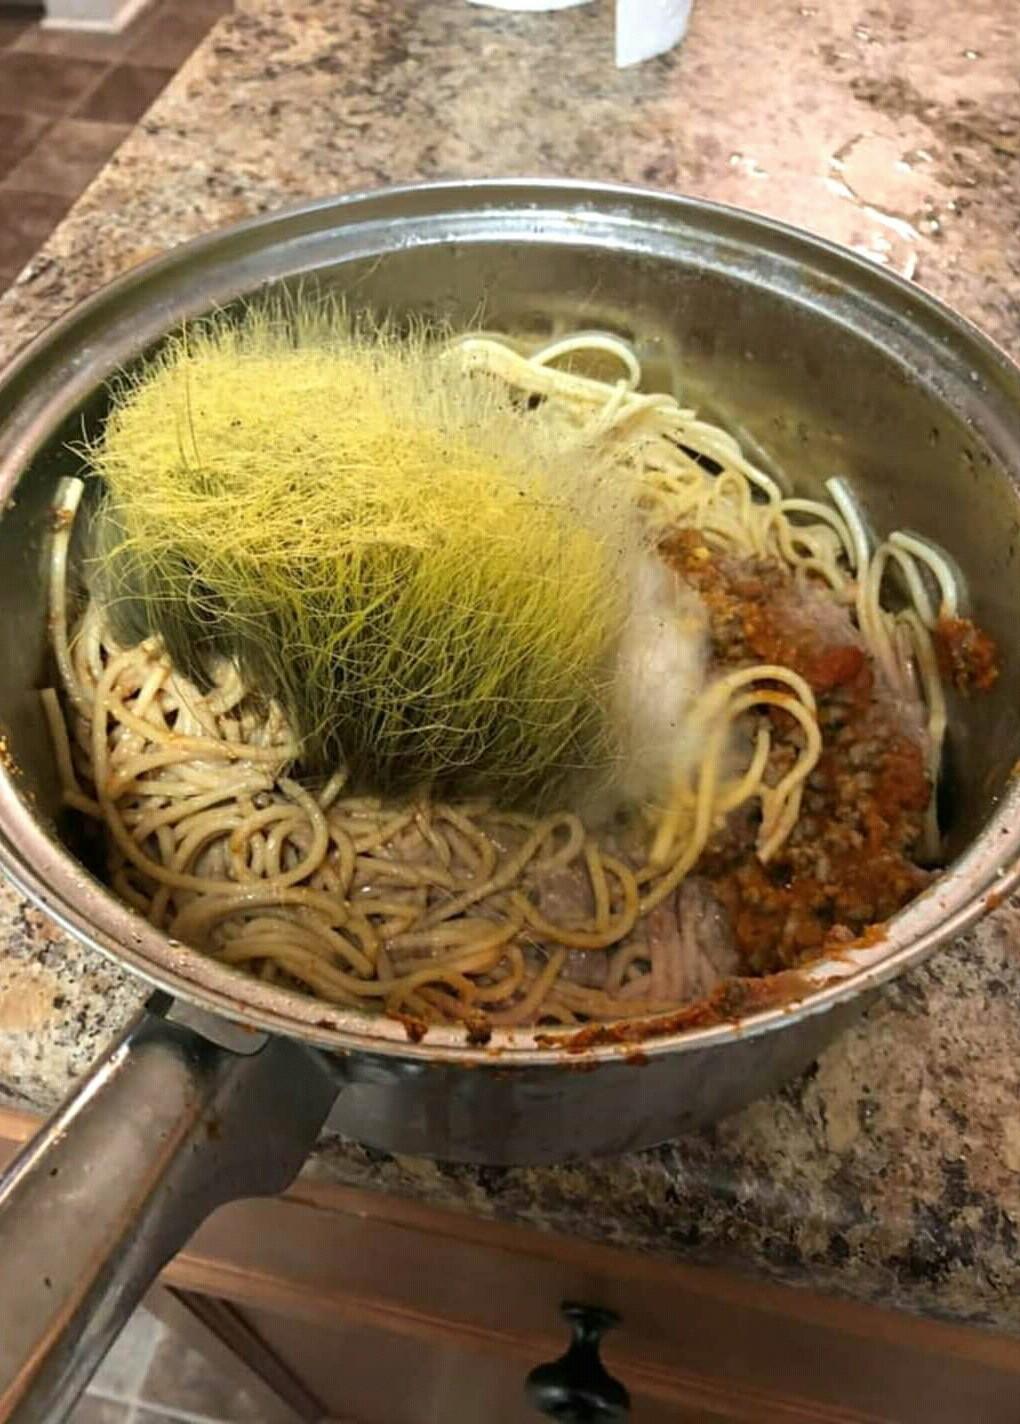 When no one touches your spaghett - meme